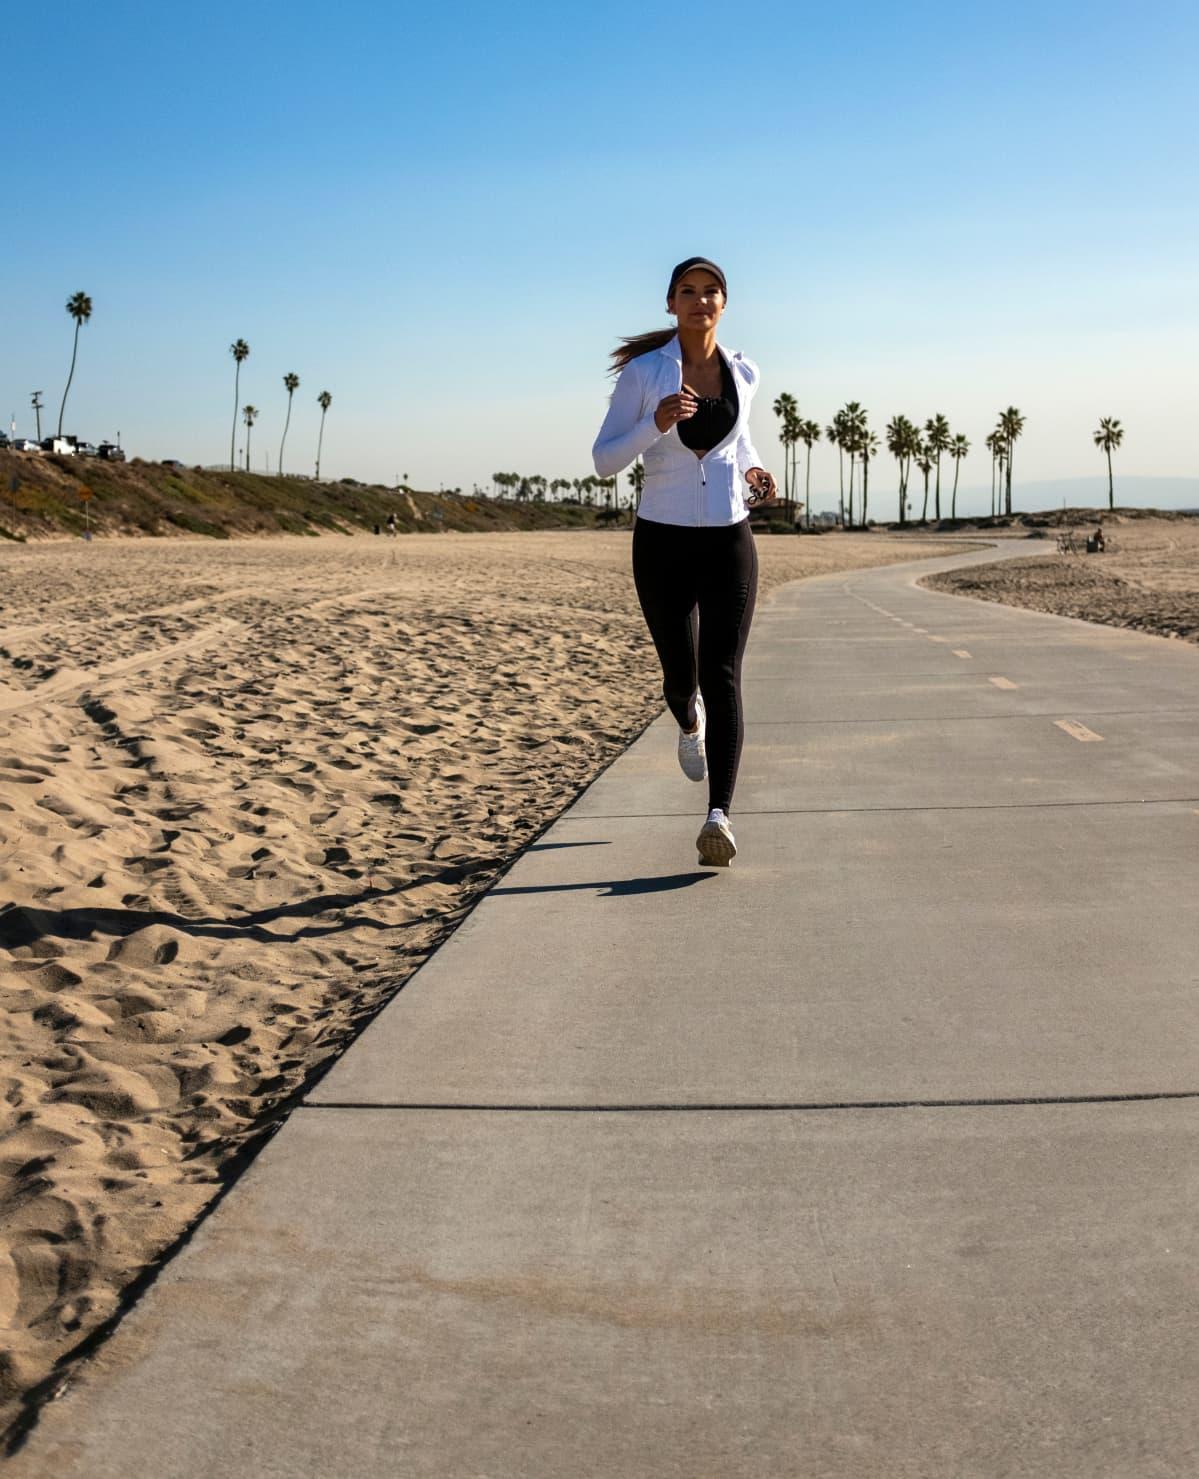 Pia Lamberg juoksee rannalla